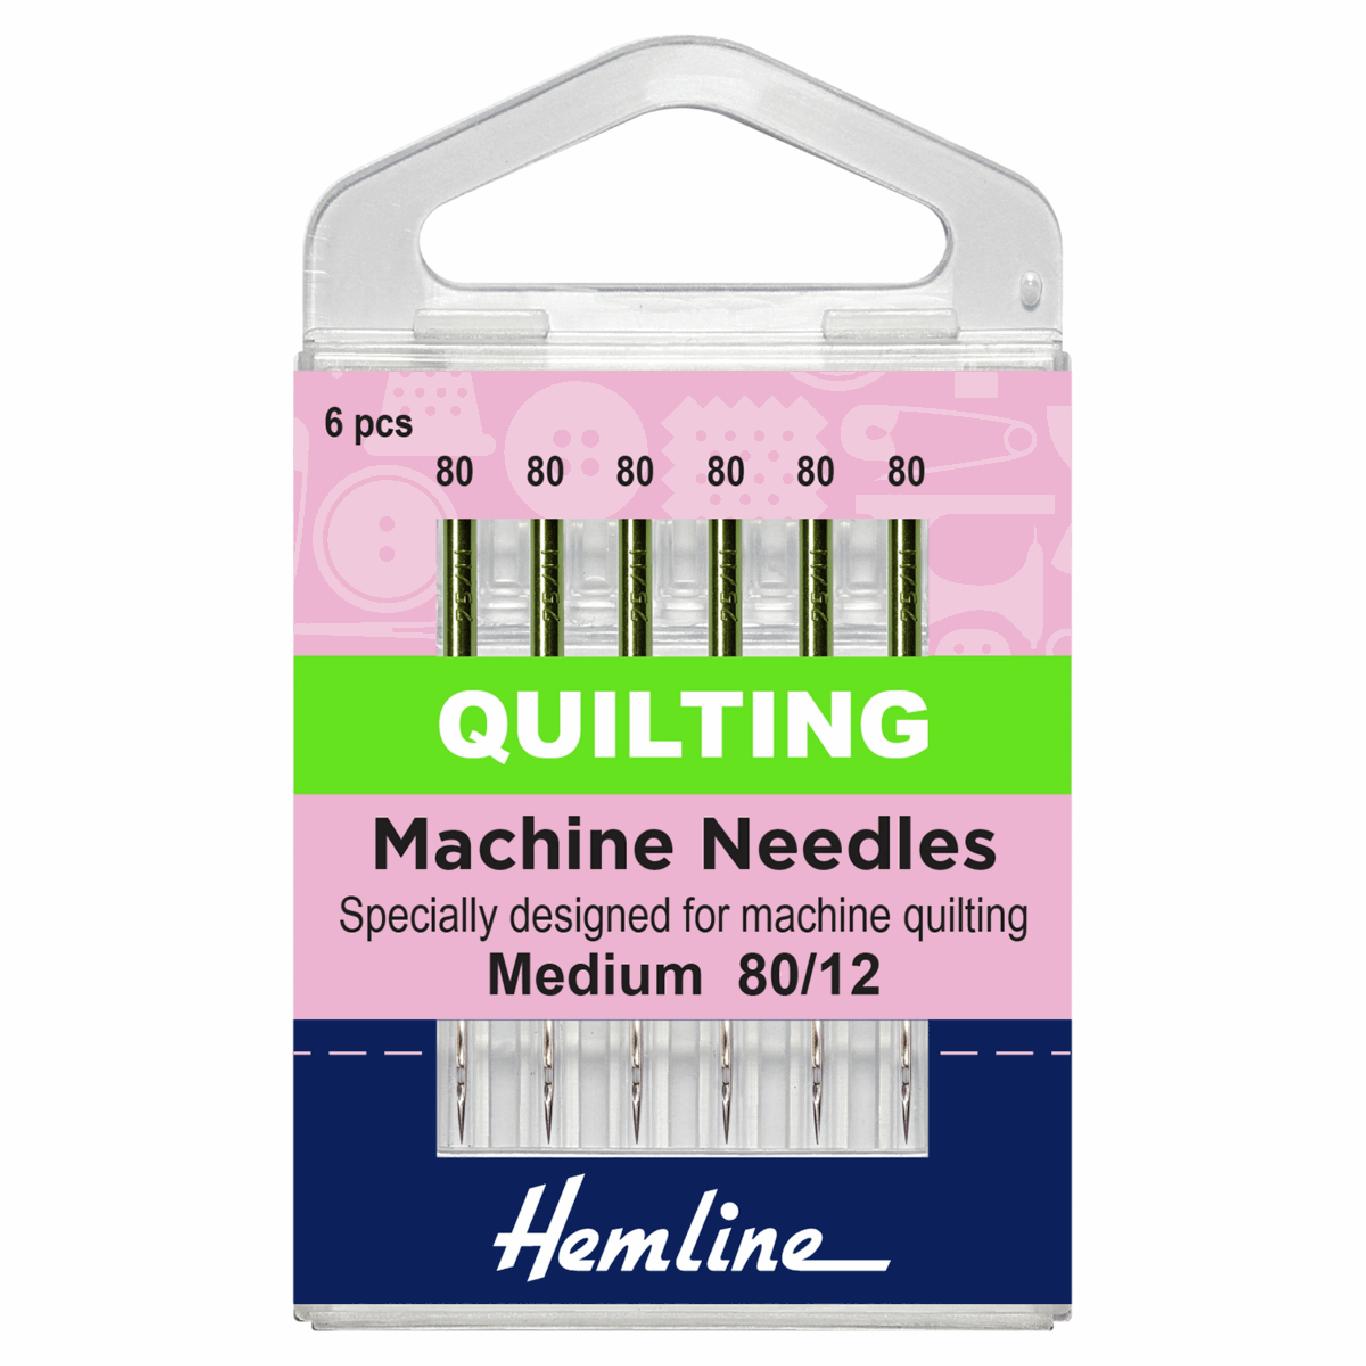 Image of Quilting Sewing Machine Needles | Medium 80/12 | 5 Pieces